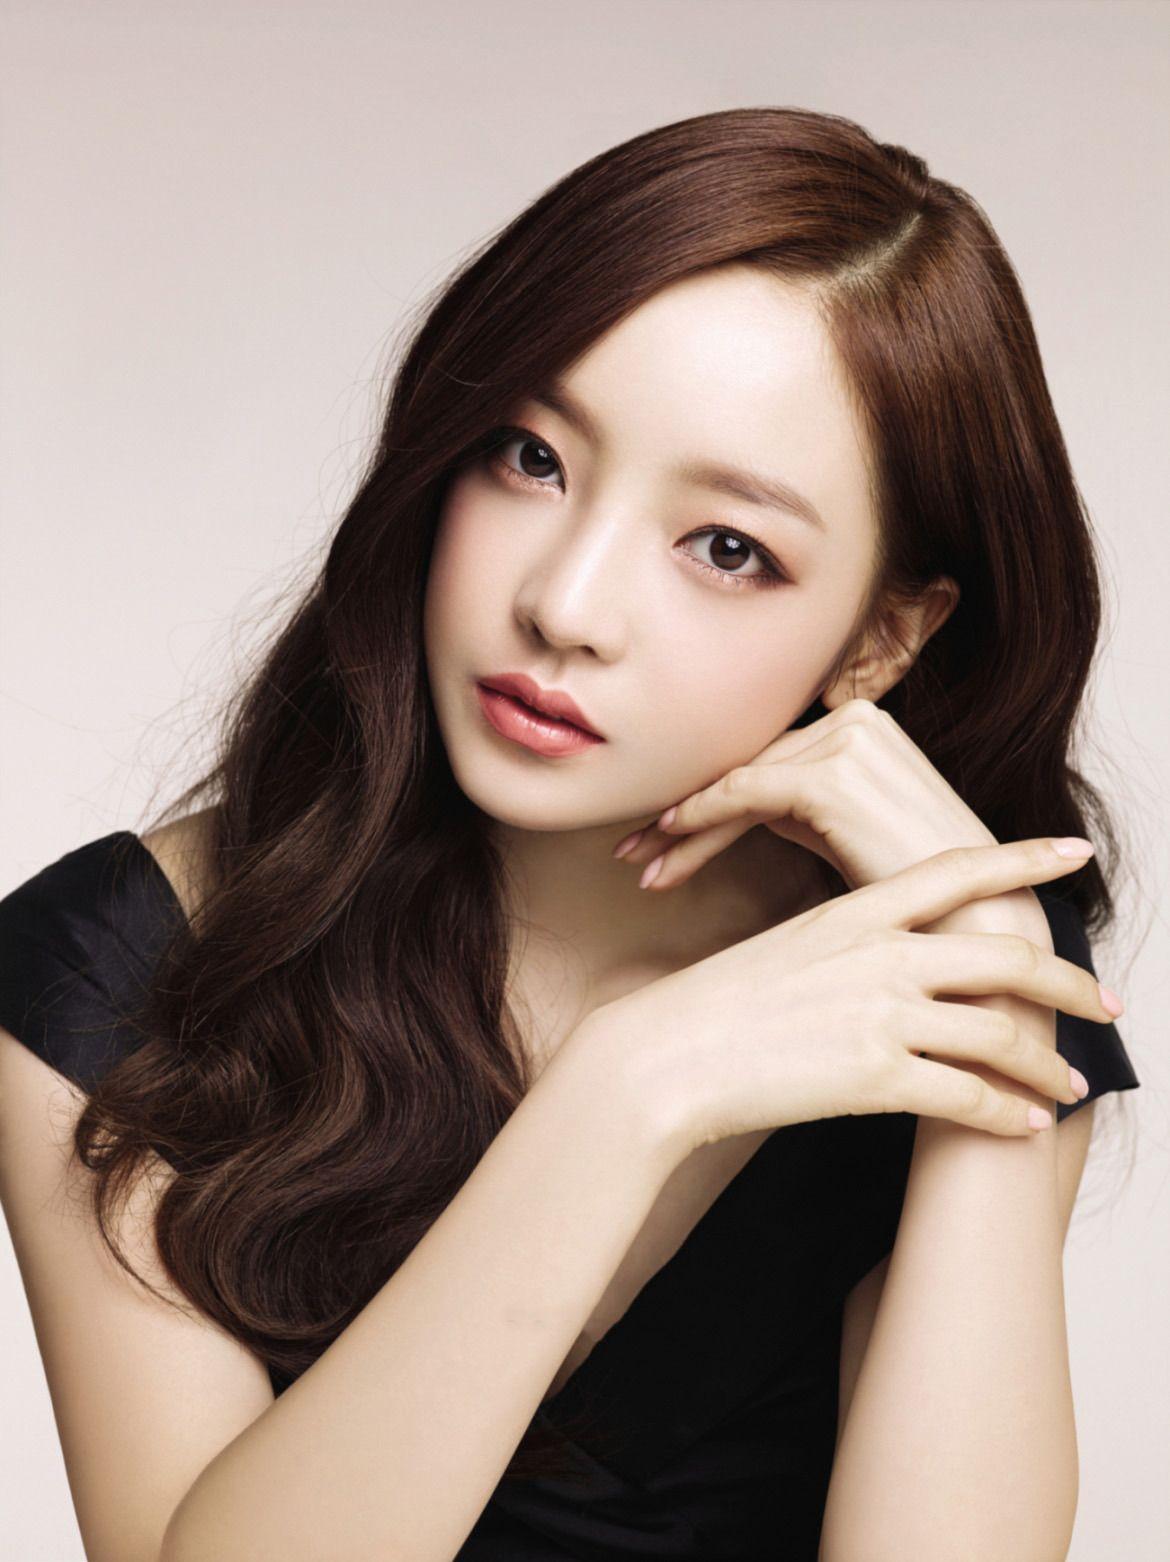 Kara Goo Hara Coreana 2015 Goo Hara Kpop Girls Beauty